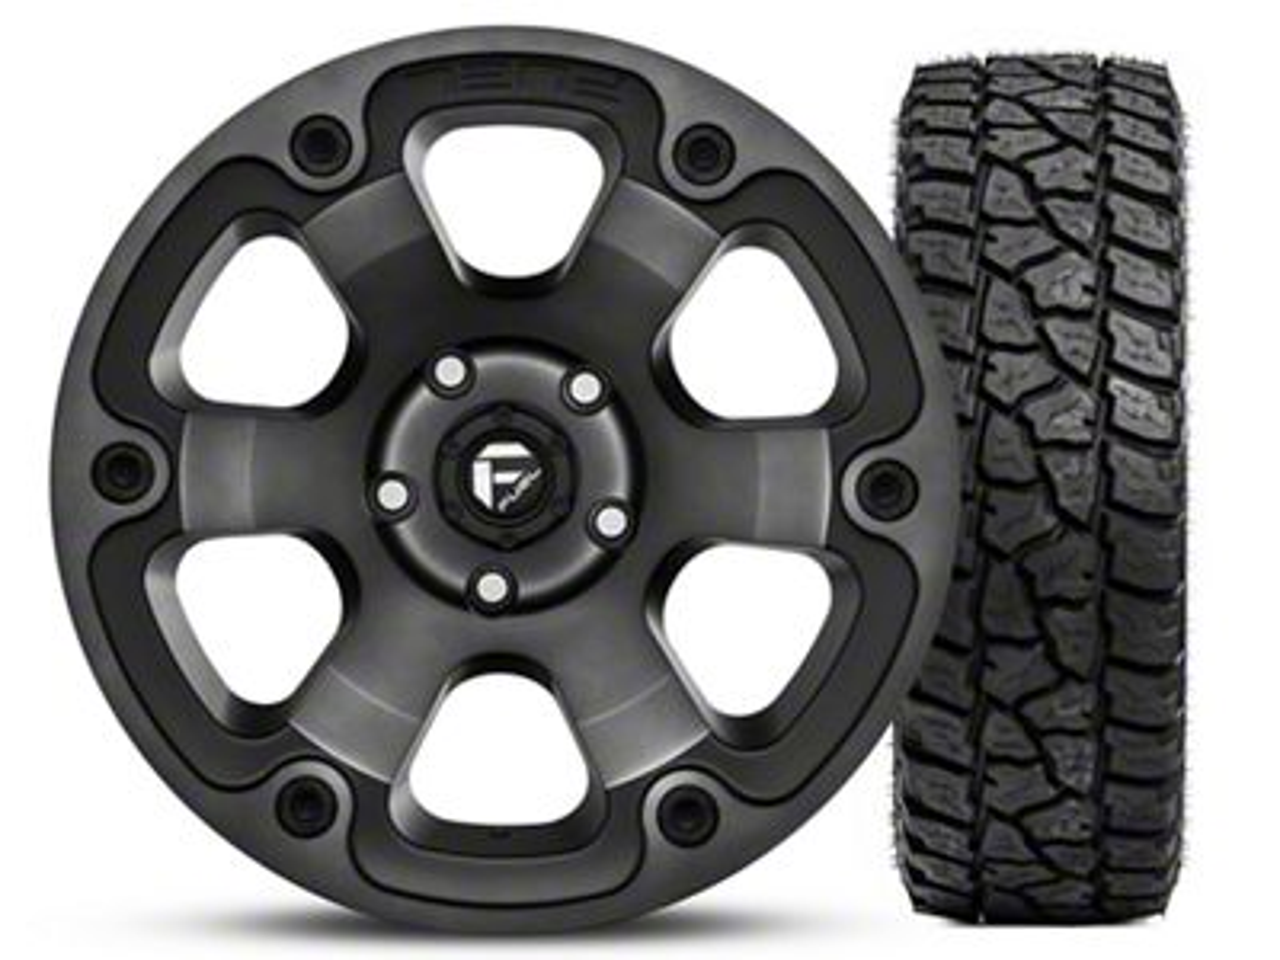 Fuel Wheels Beast Black Machined Wheel 17x9 and Mickey Thompson Baja ATZP3 LT265/70R17 Kit (07-18 Jeep Wrangler JK; 2018 Jeep Wrangler JL)